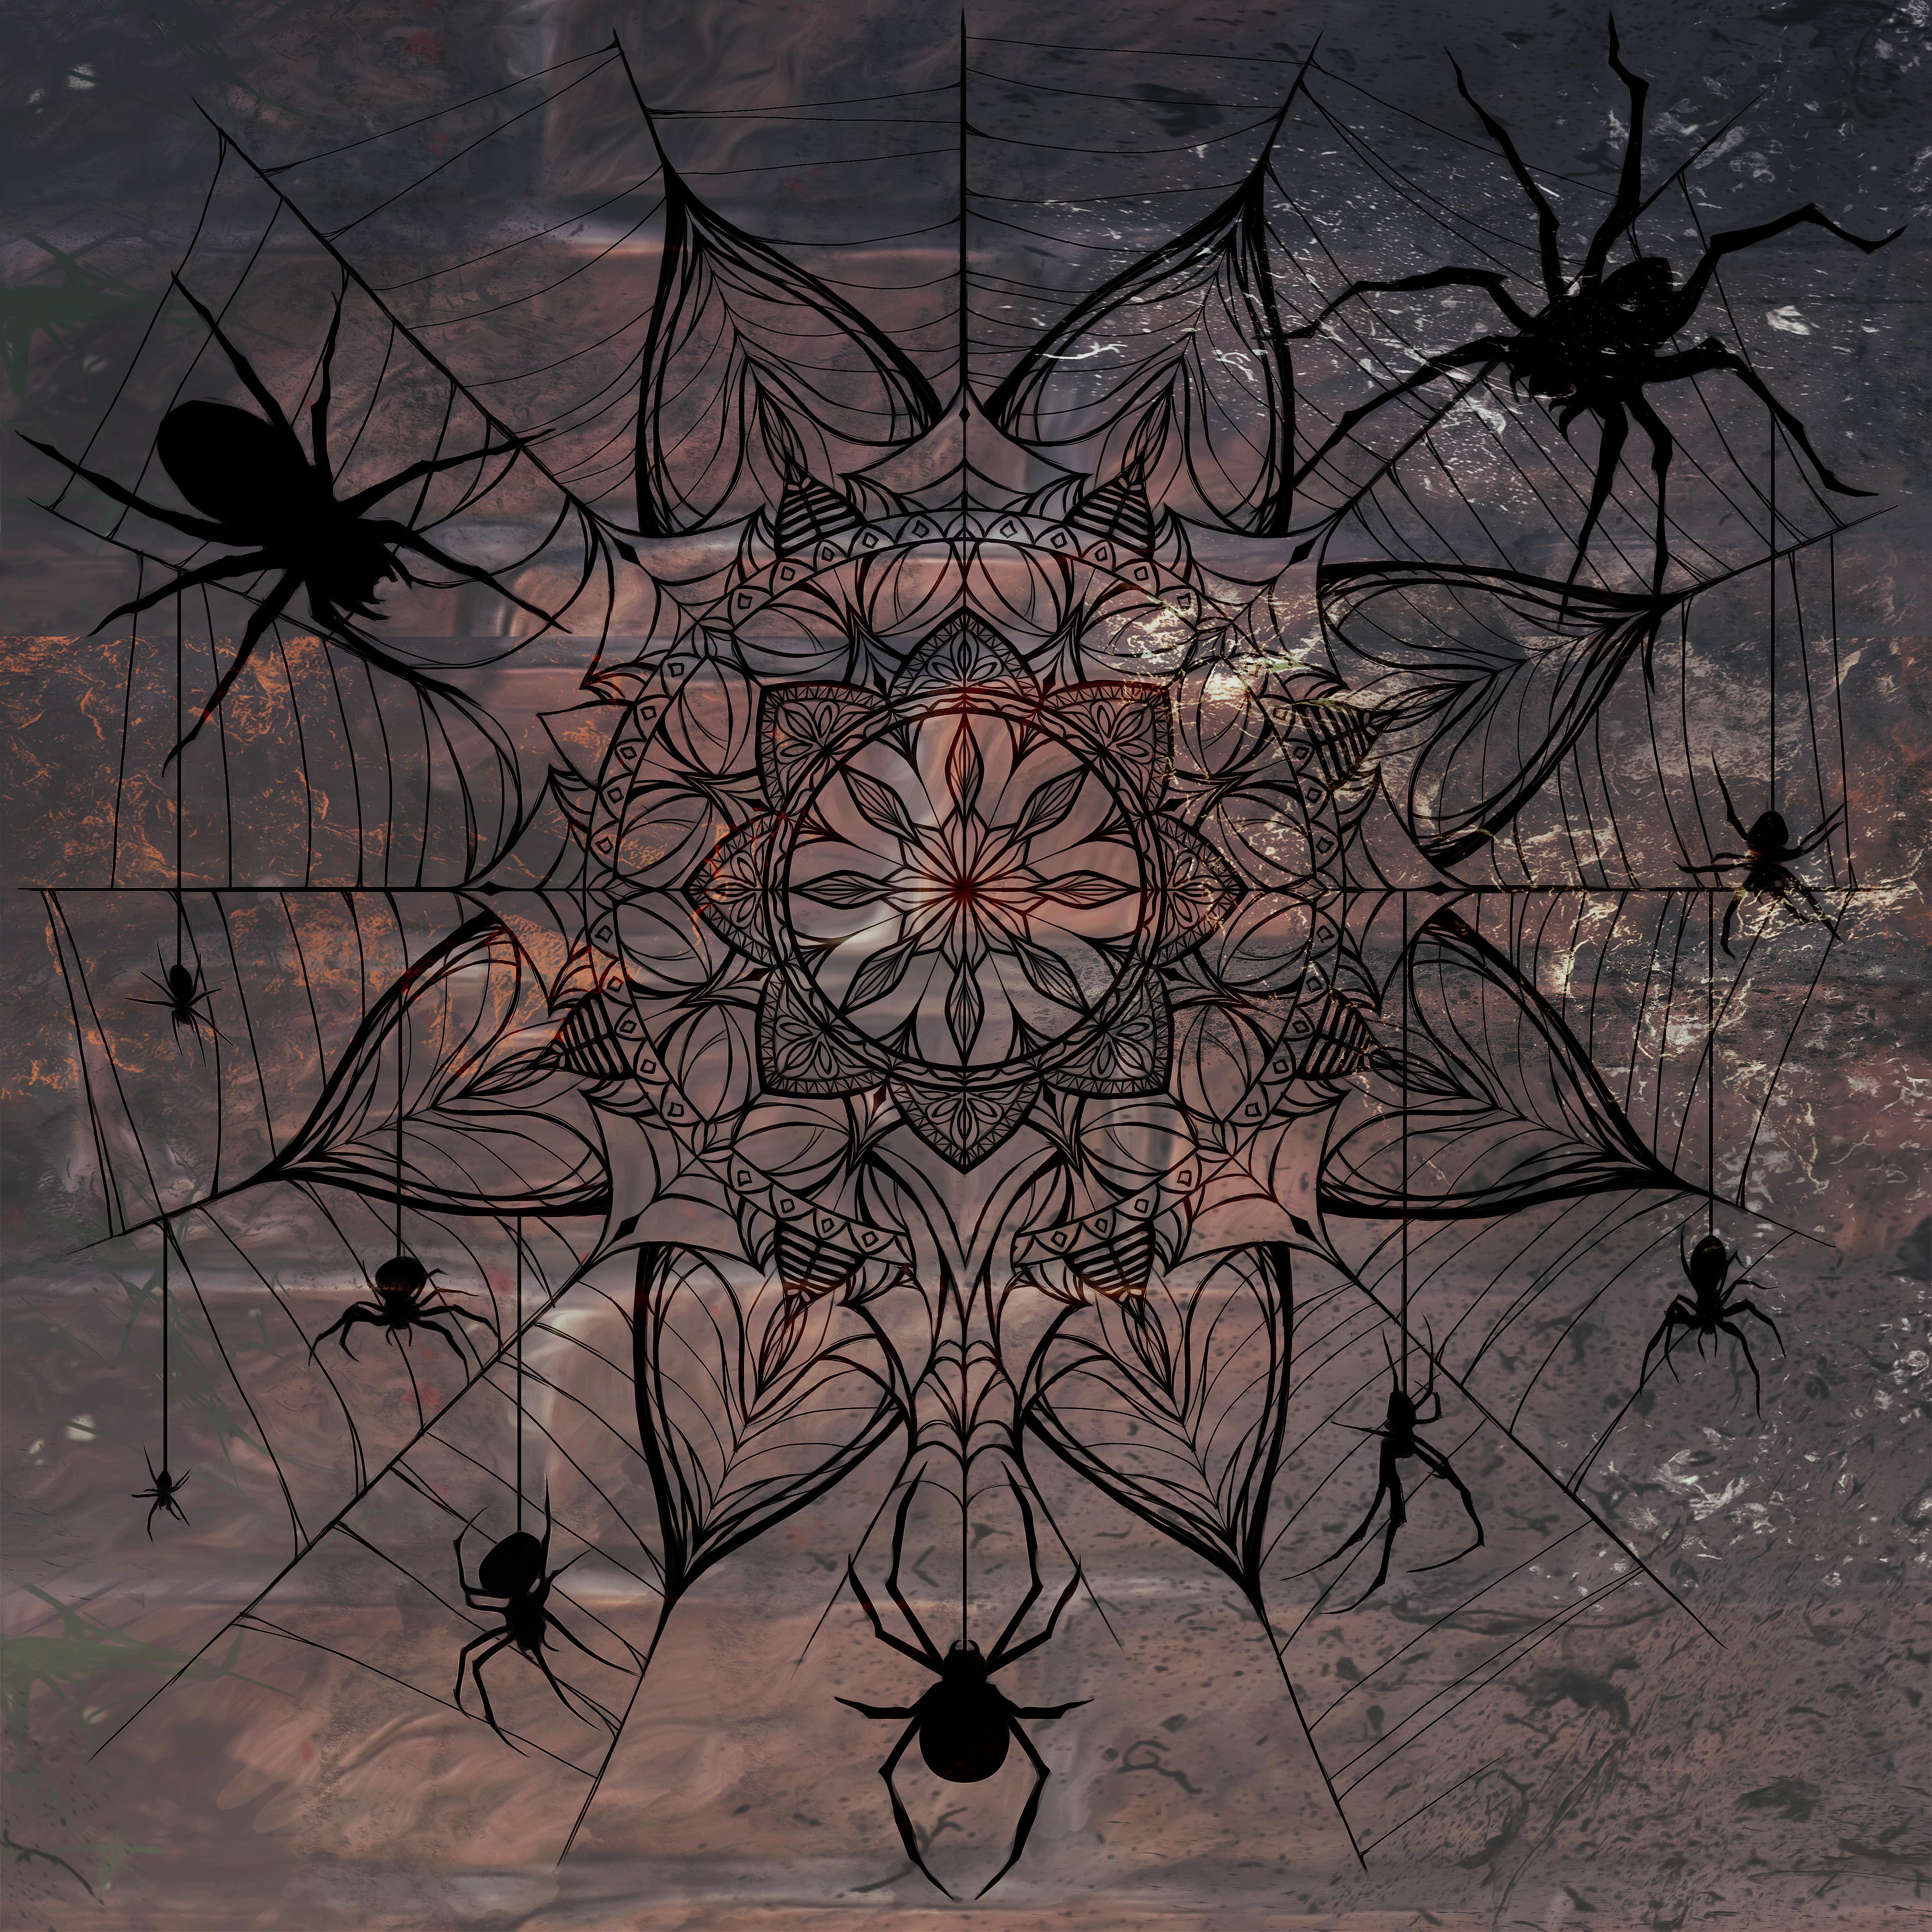 spidermandala